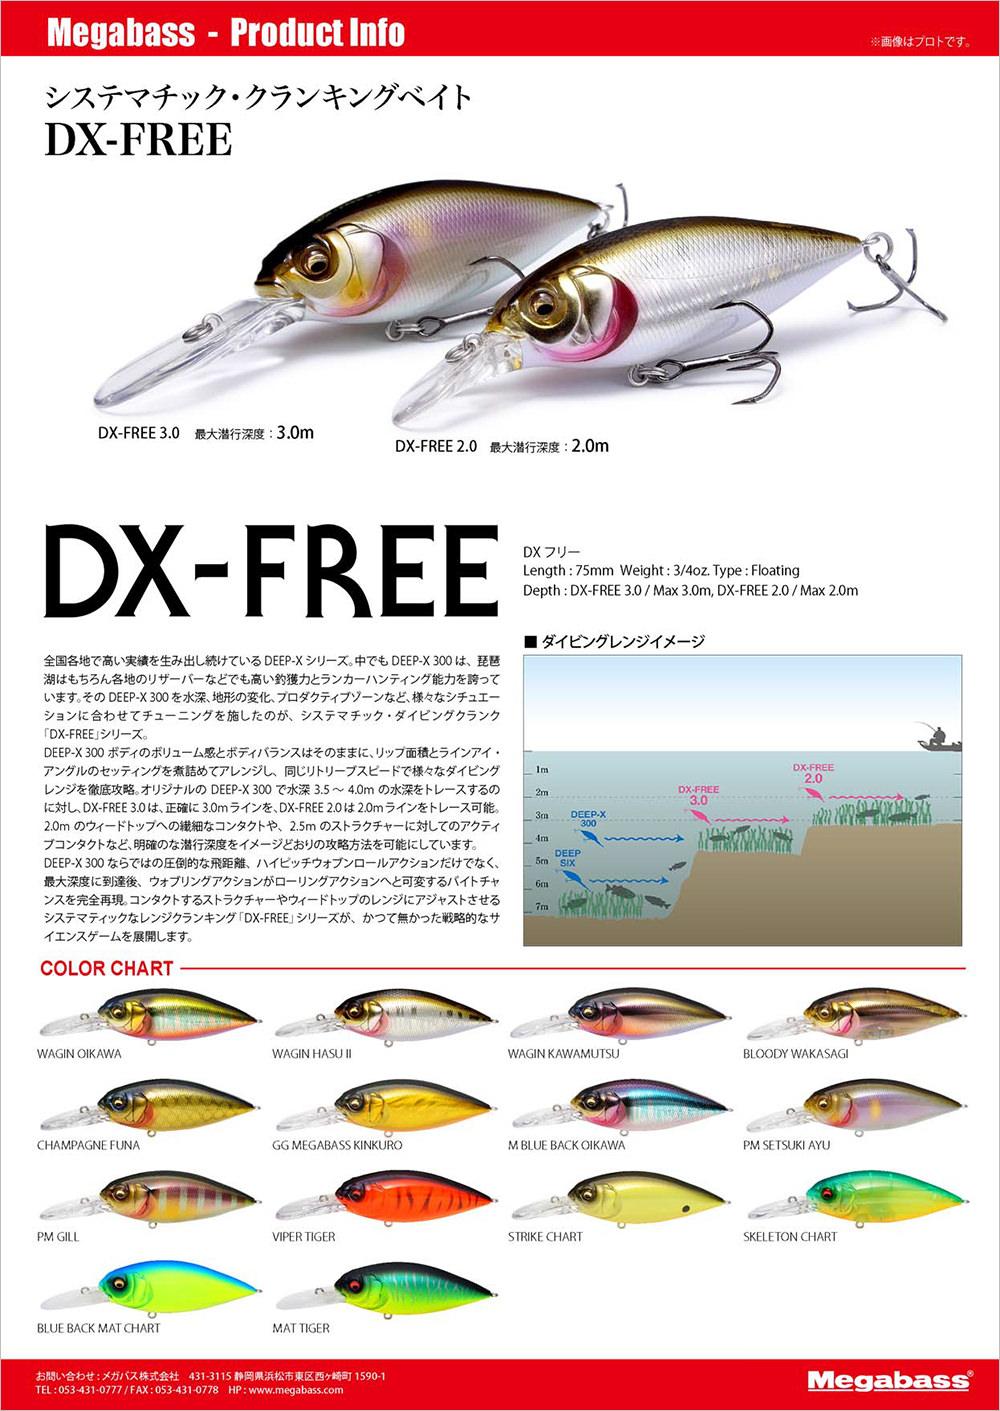 DX-FREE